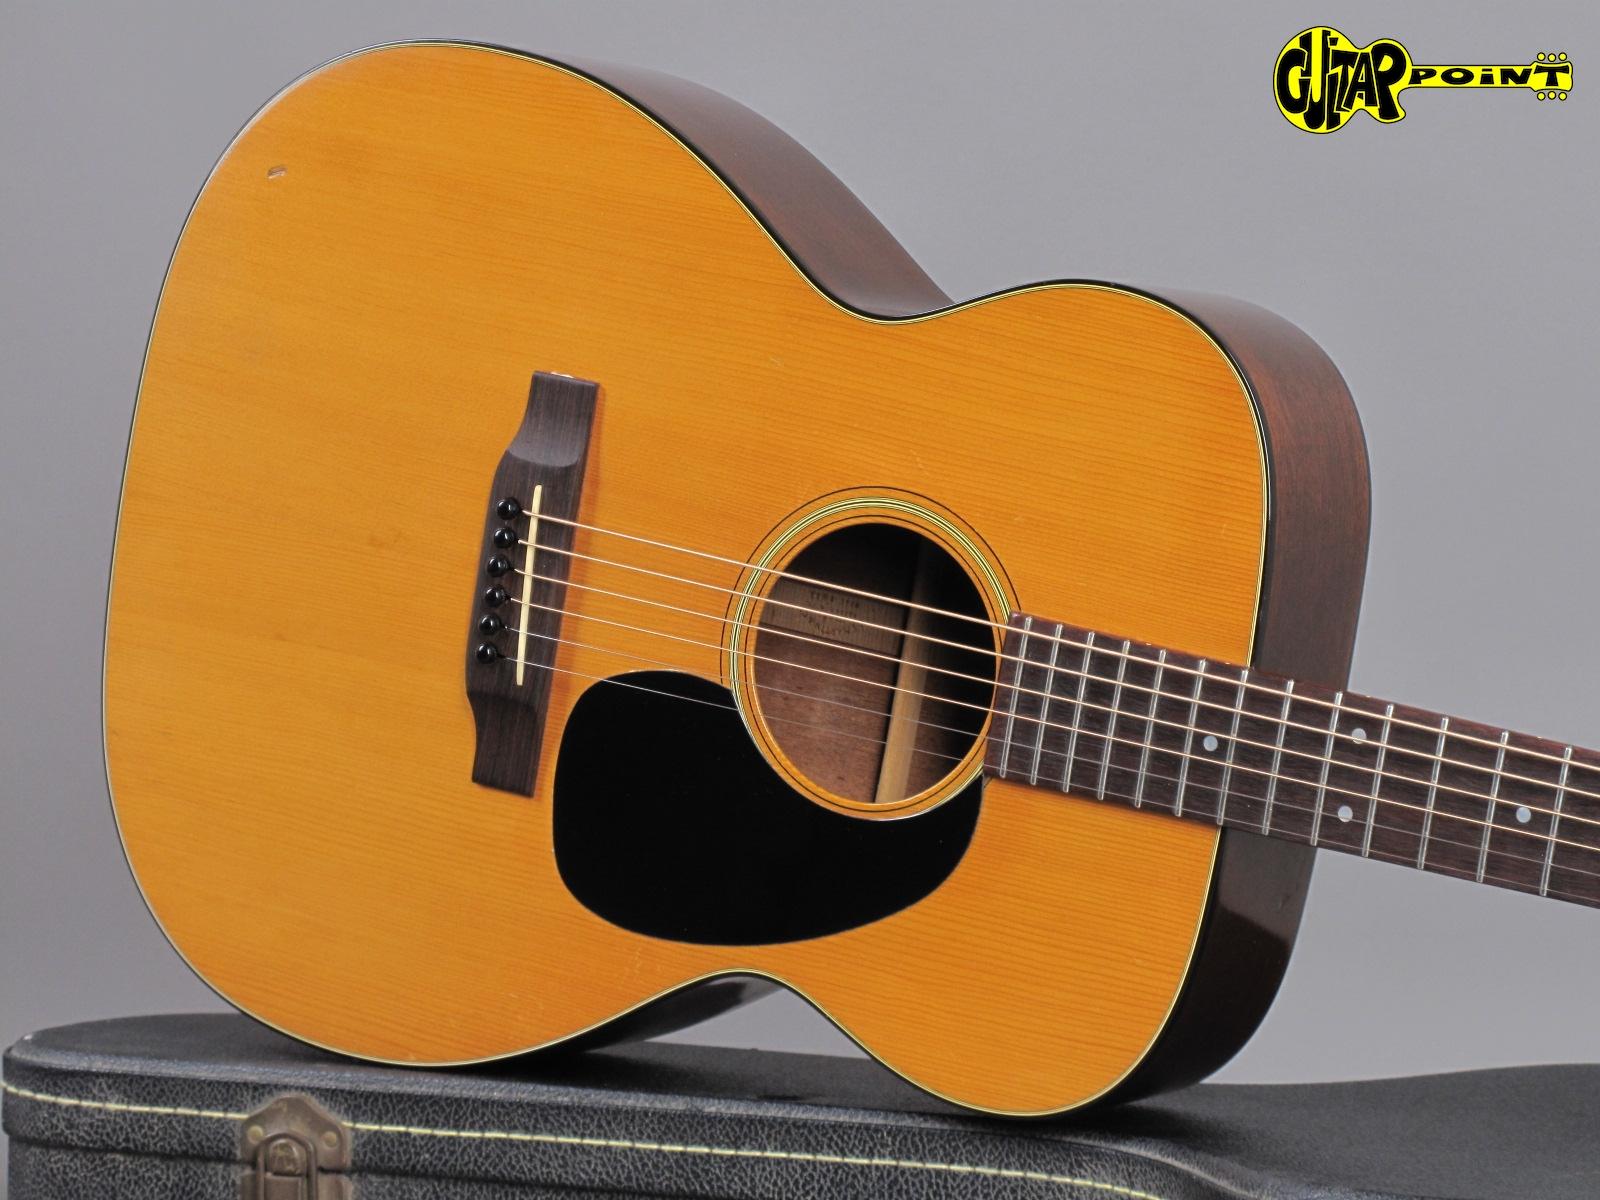 https://guitarpoint.de/app/uploads/products/1971-martin-000-18-natural-3/Martin71_000-18NT_275528_19.jpg